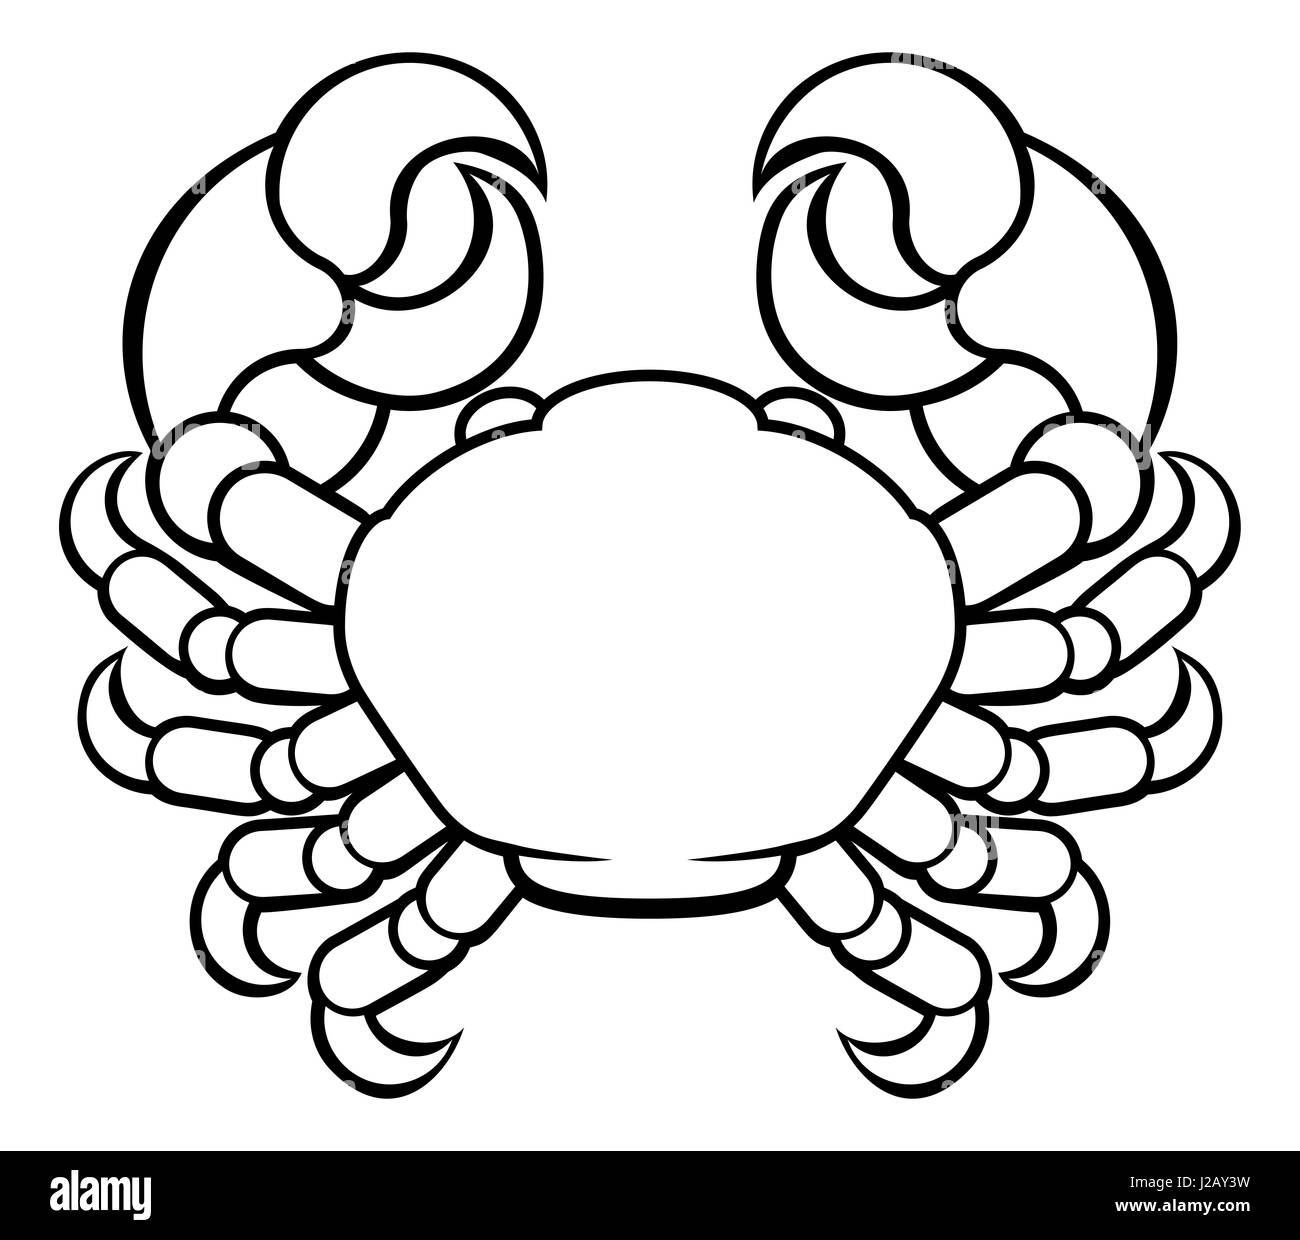 Astrology Horoscope Zodiac Signs Circular Cancer Crab Symbol Stock